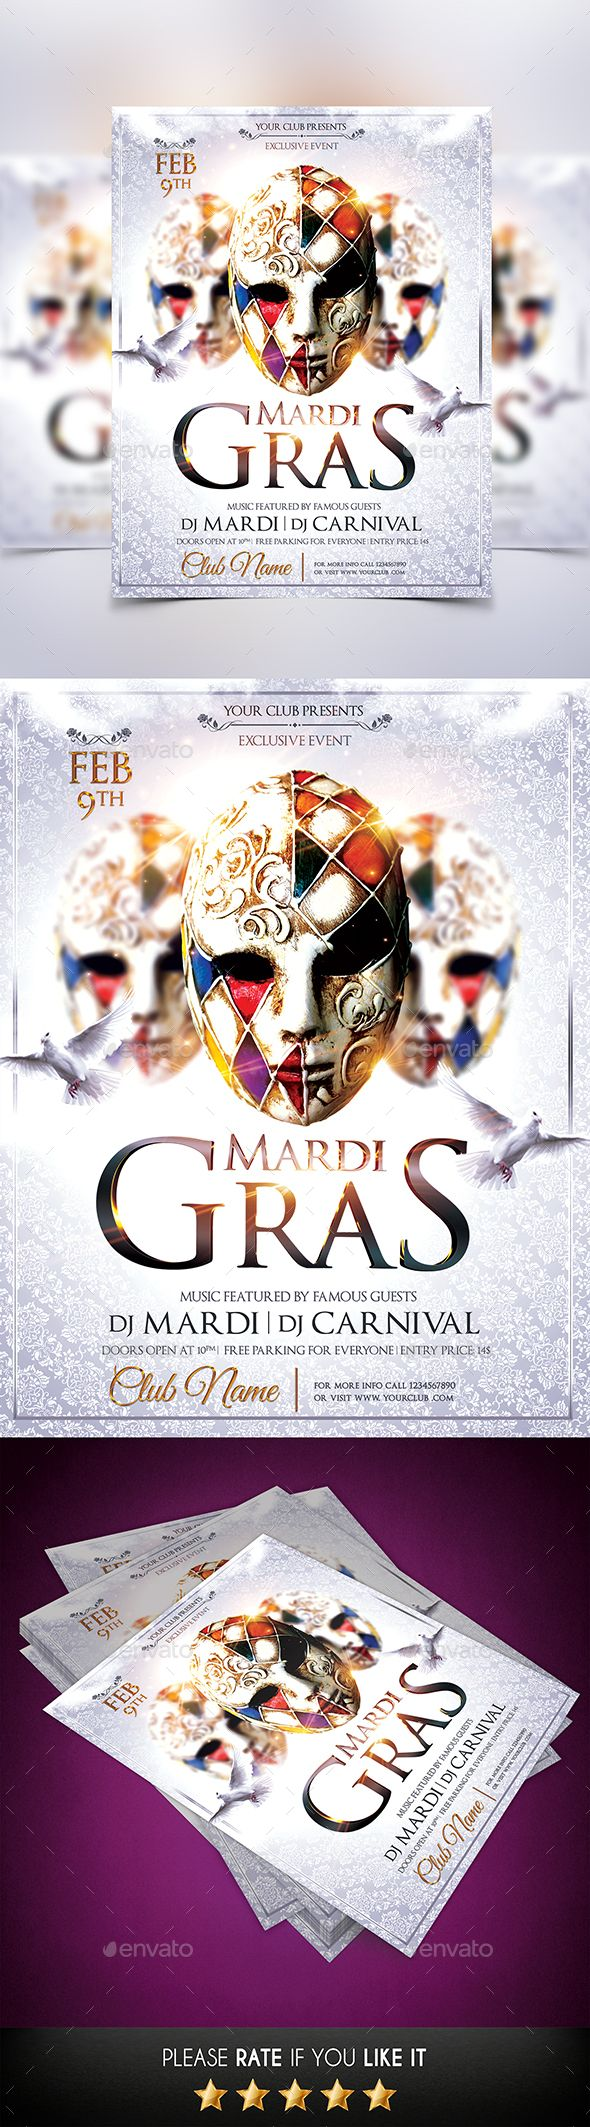 Mardi Gras Flyer Template PSD #design Download: http://graphicriver.net/item/mardi-gras-flyer/14468152?ref=ksioks